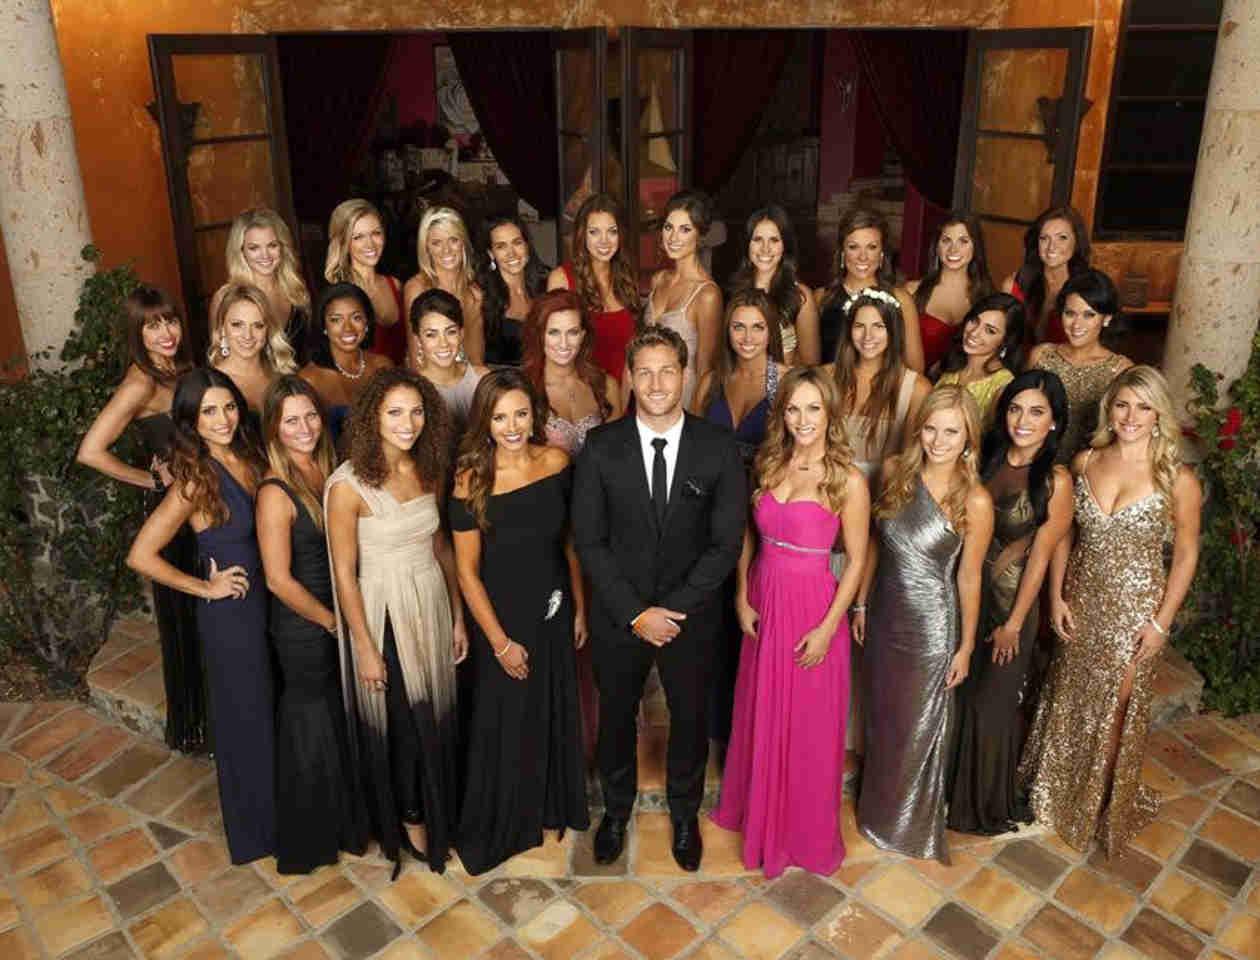 Who Does Juan Pablo Galavis Pick? Huge Bachelor 2014 Spoiler!